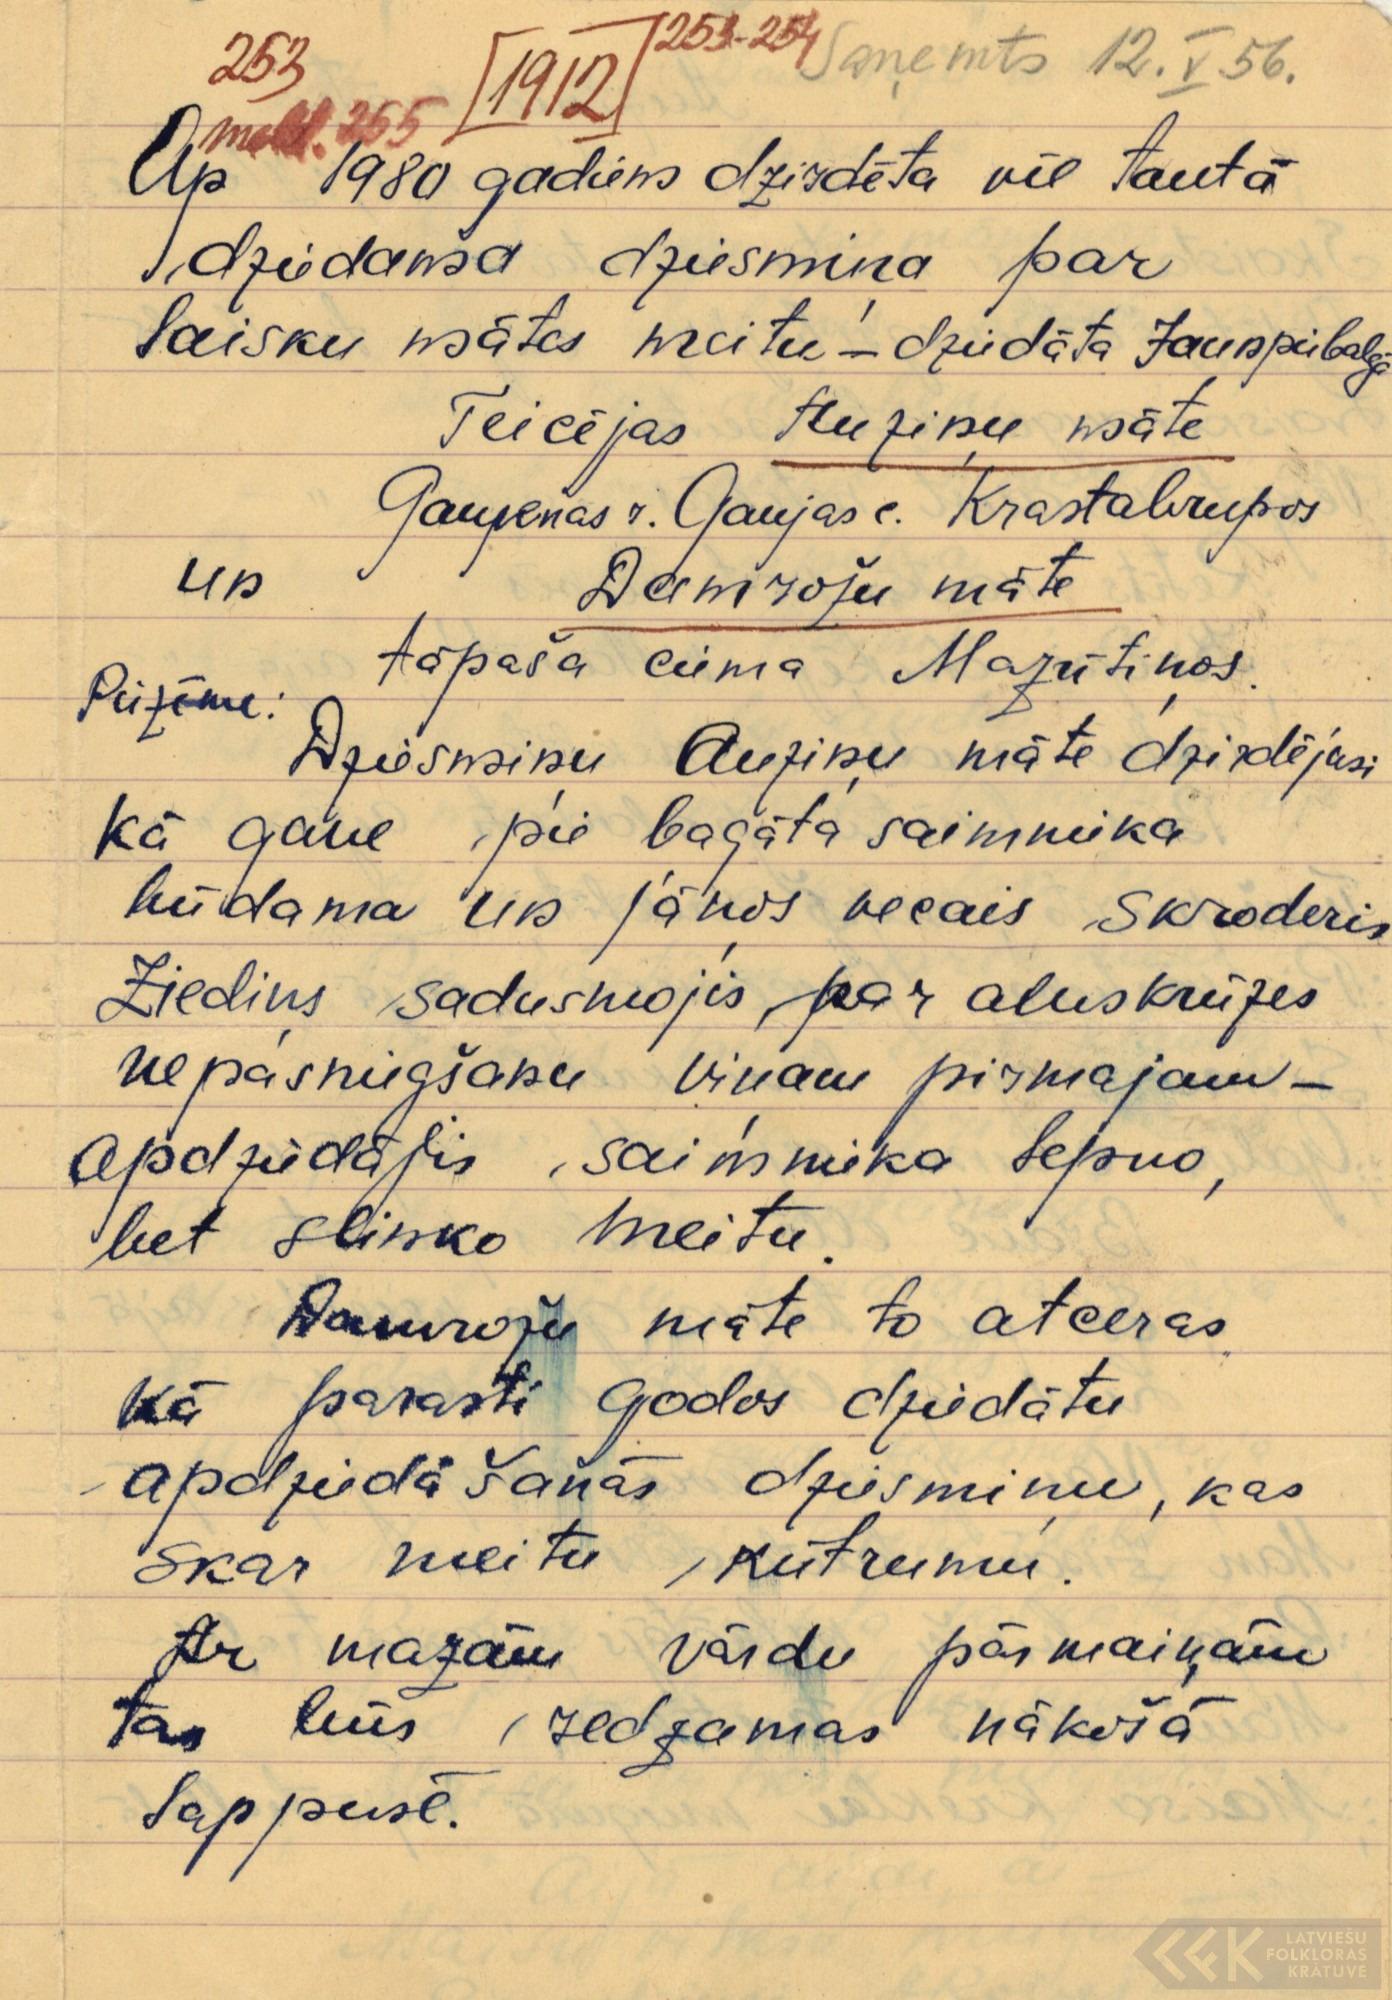 1912-J-un-A-Robeznieki-03-0001